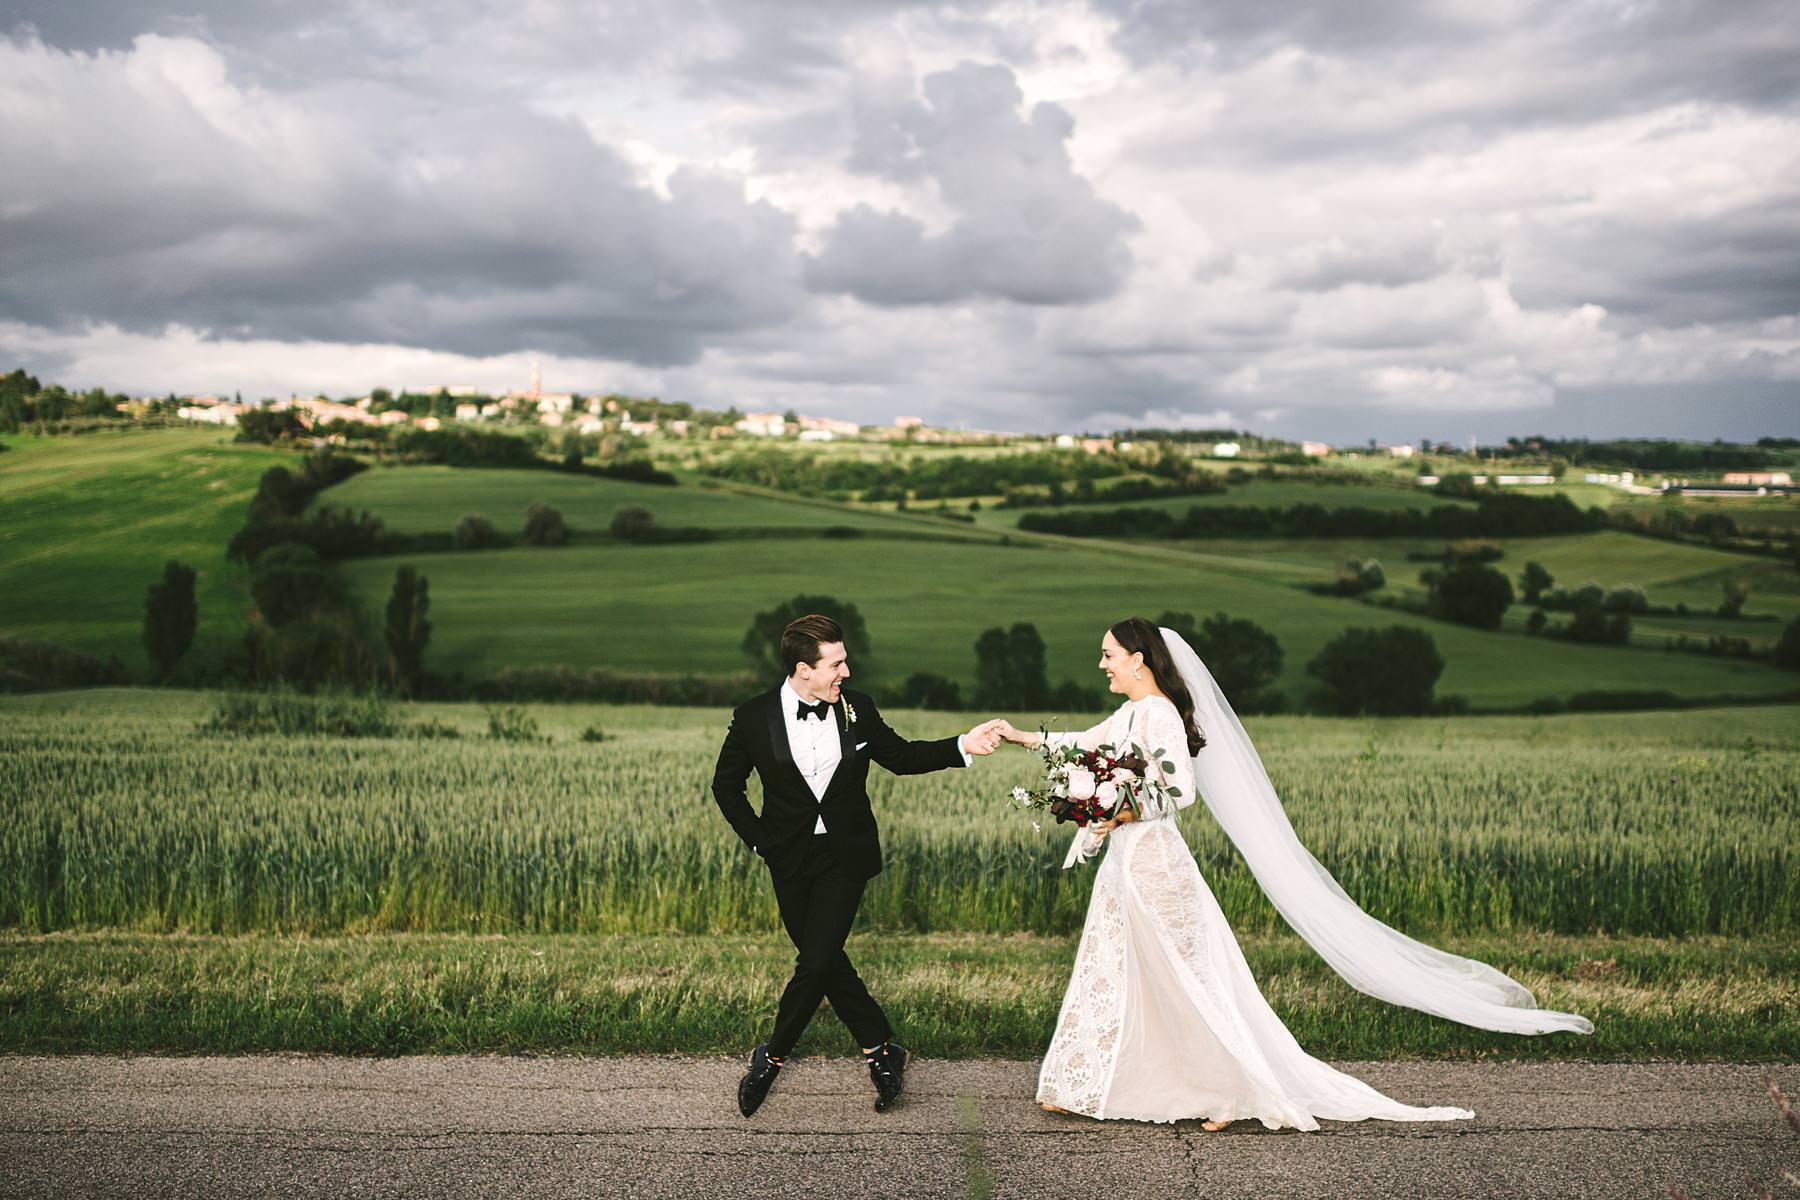 Bride and groom wedding portrait in Umbria near Villa l'Antica Posta. Elegant and exciting symbolic wedding in Italy